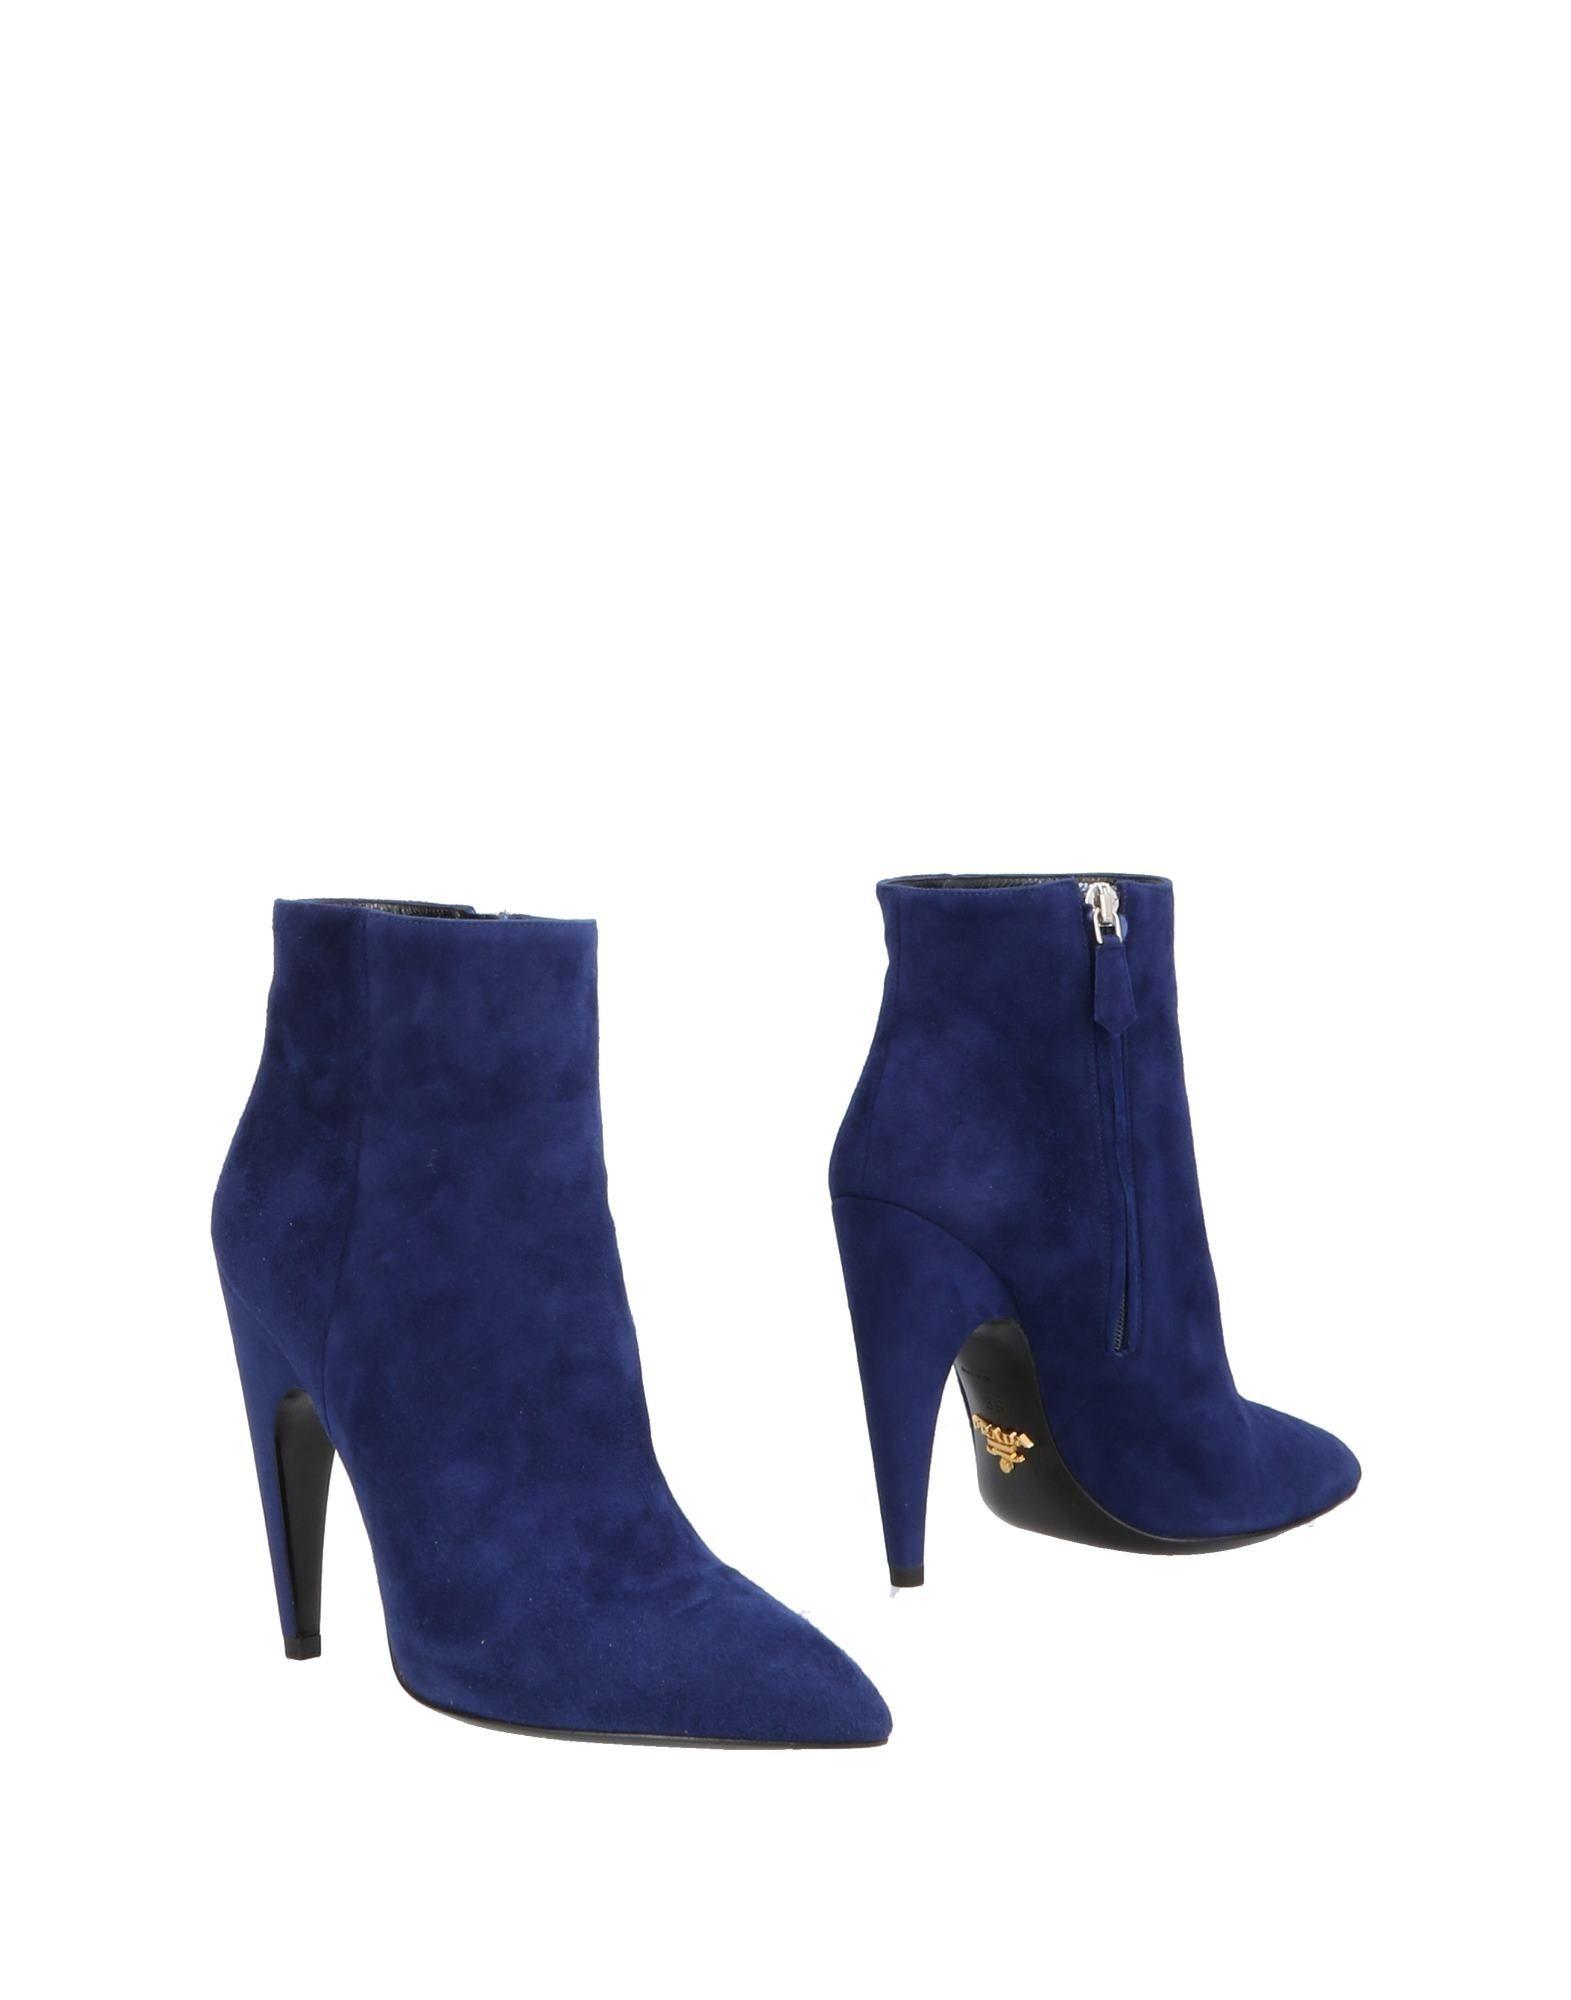 Prada Ankle Boot - Women on Prada Ankle Boots online on Women  Australia - 11505317FL 627b1b